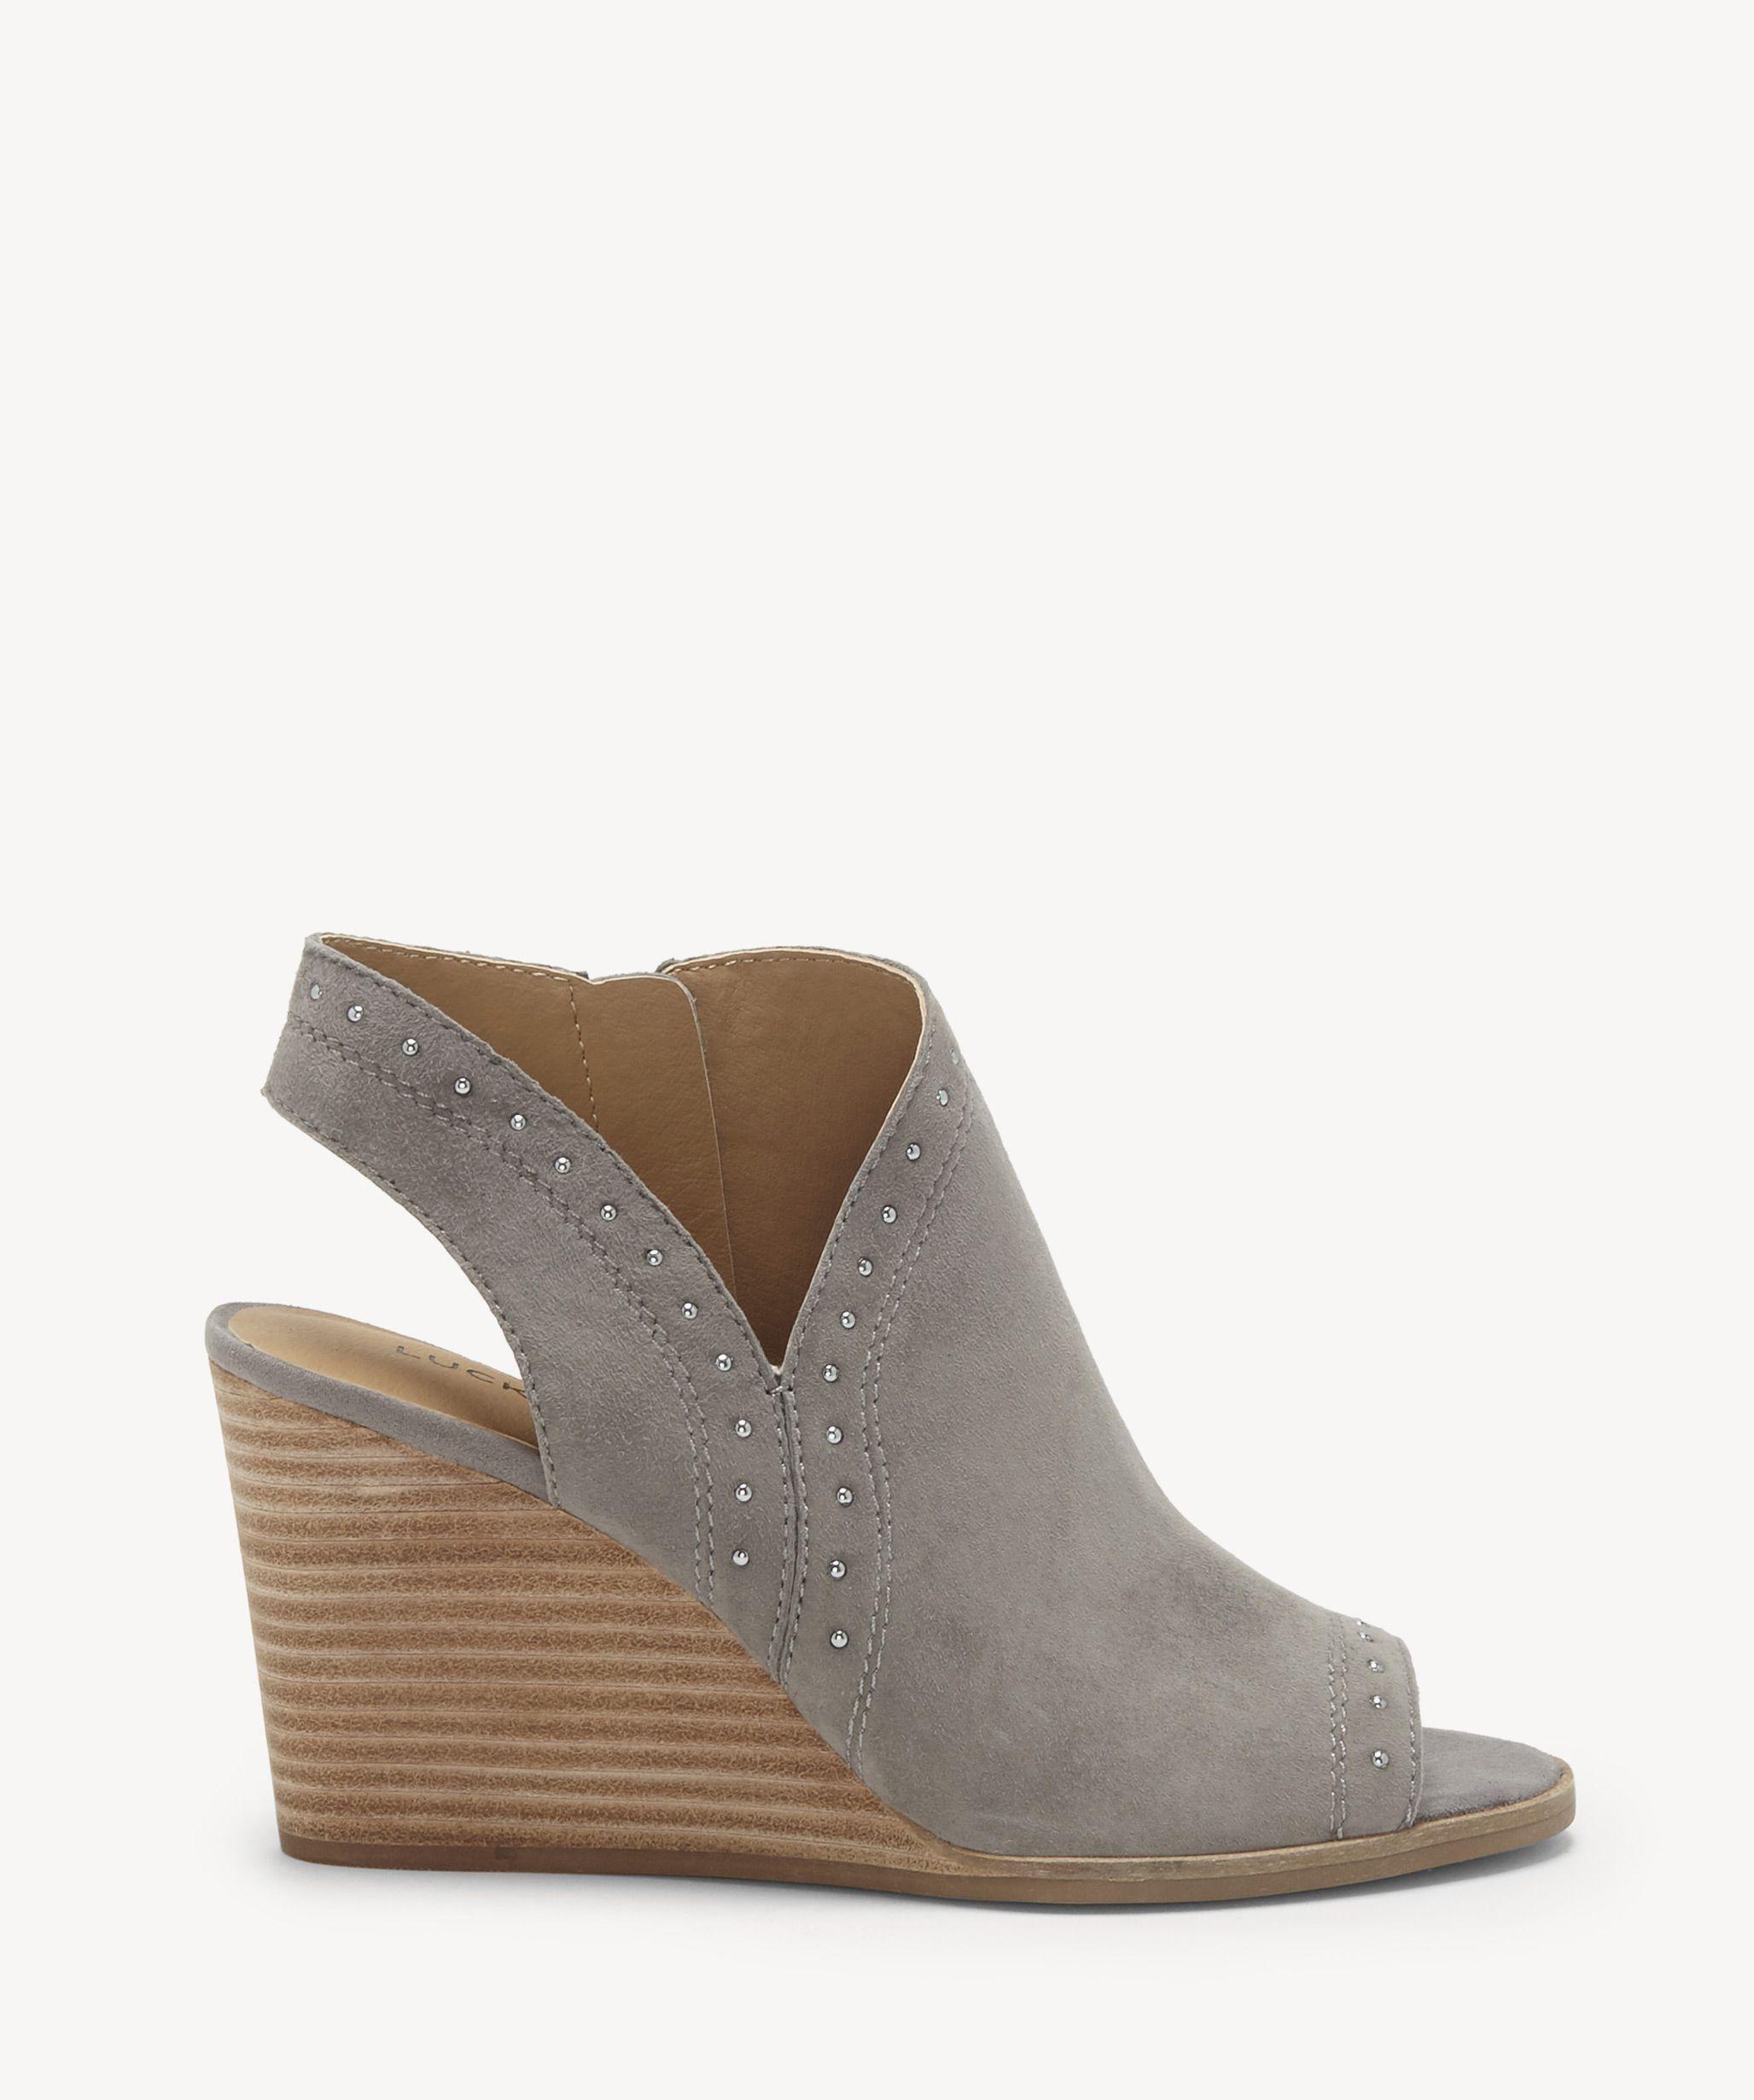 2ea8258f44c Lucky Brand Women s Ulyssas Peep Toe Wedges Titanium